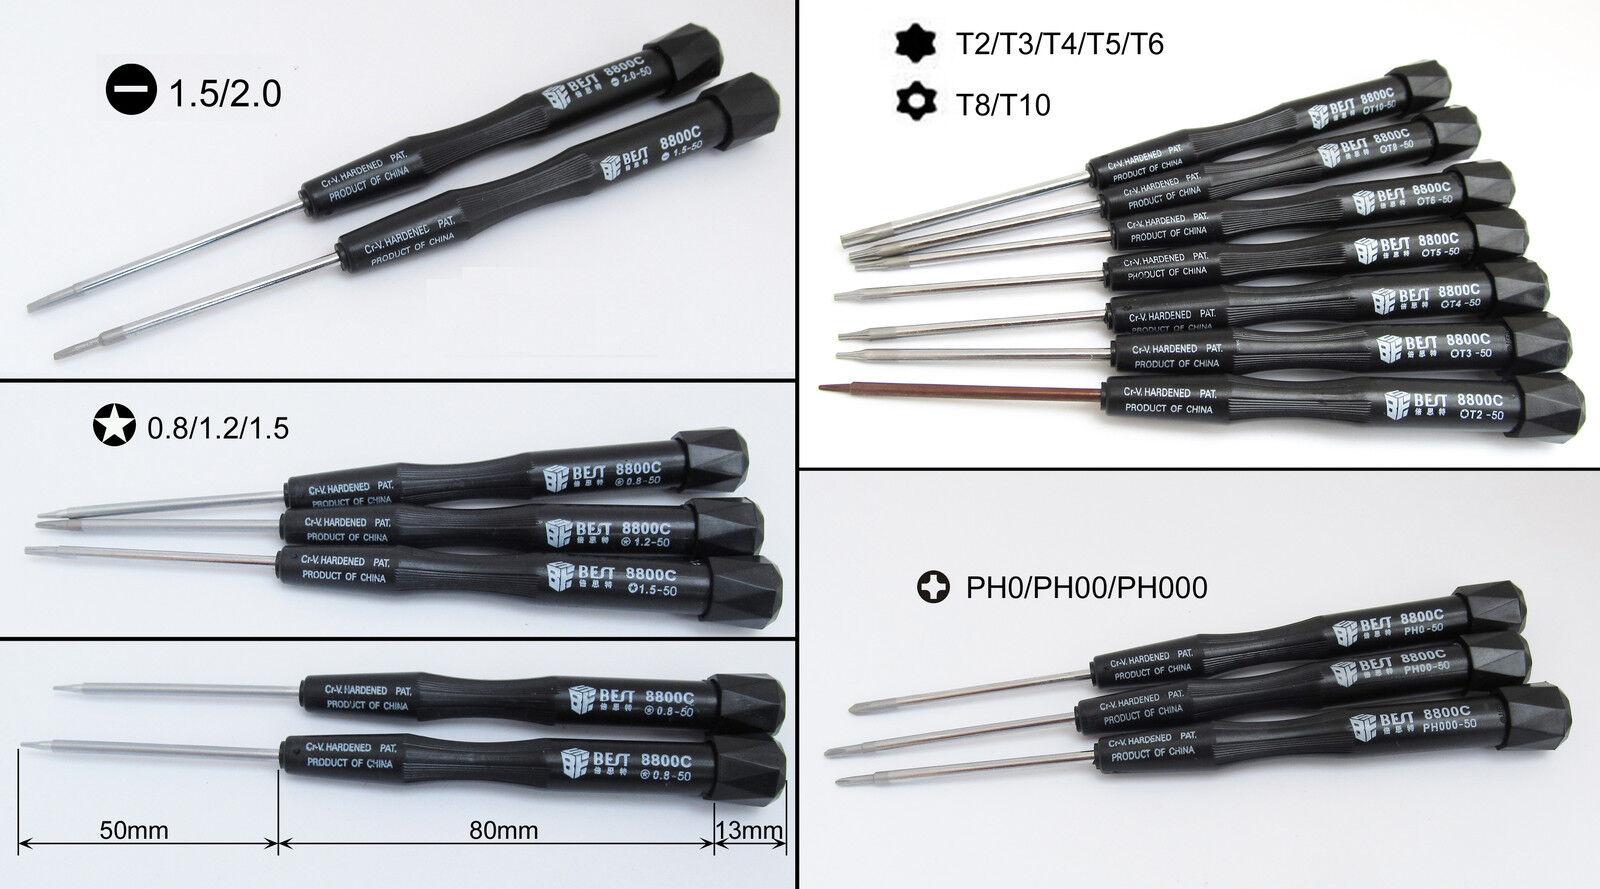 100x Best 8800C 8800C 8800C Screwdriver phone Laptop Repair Tool Torx Slotted Phillips Star a20d76